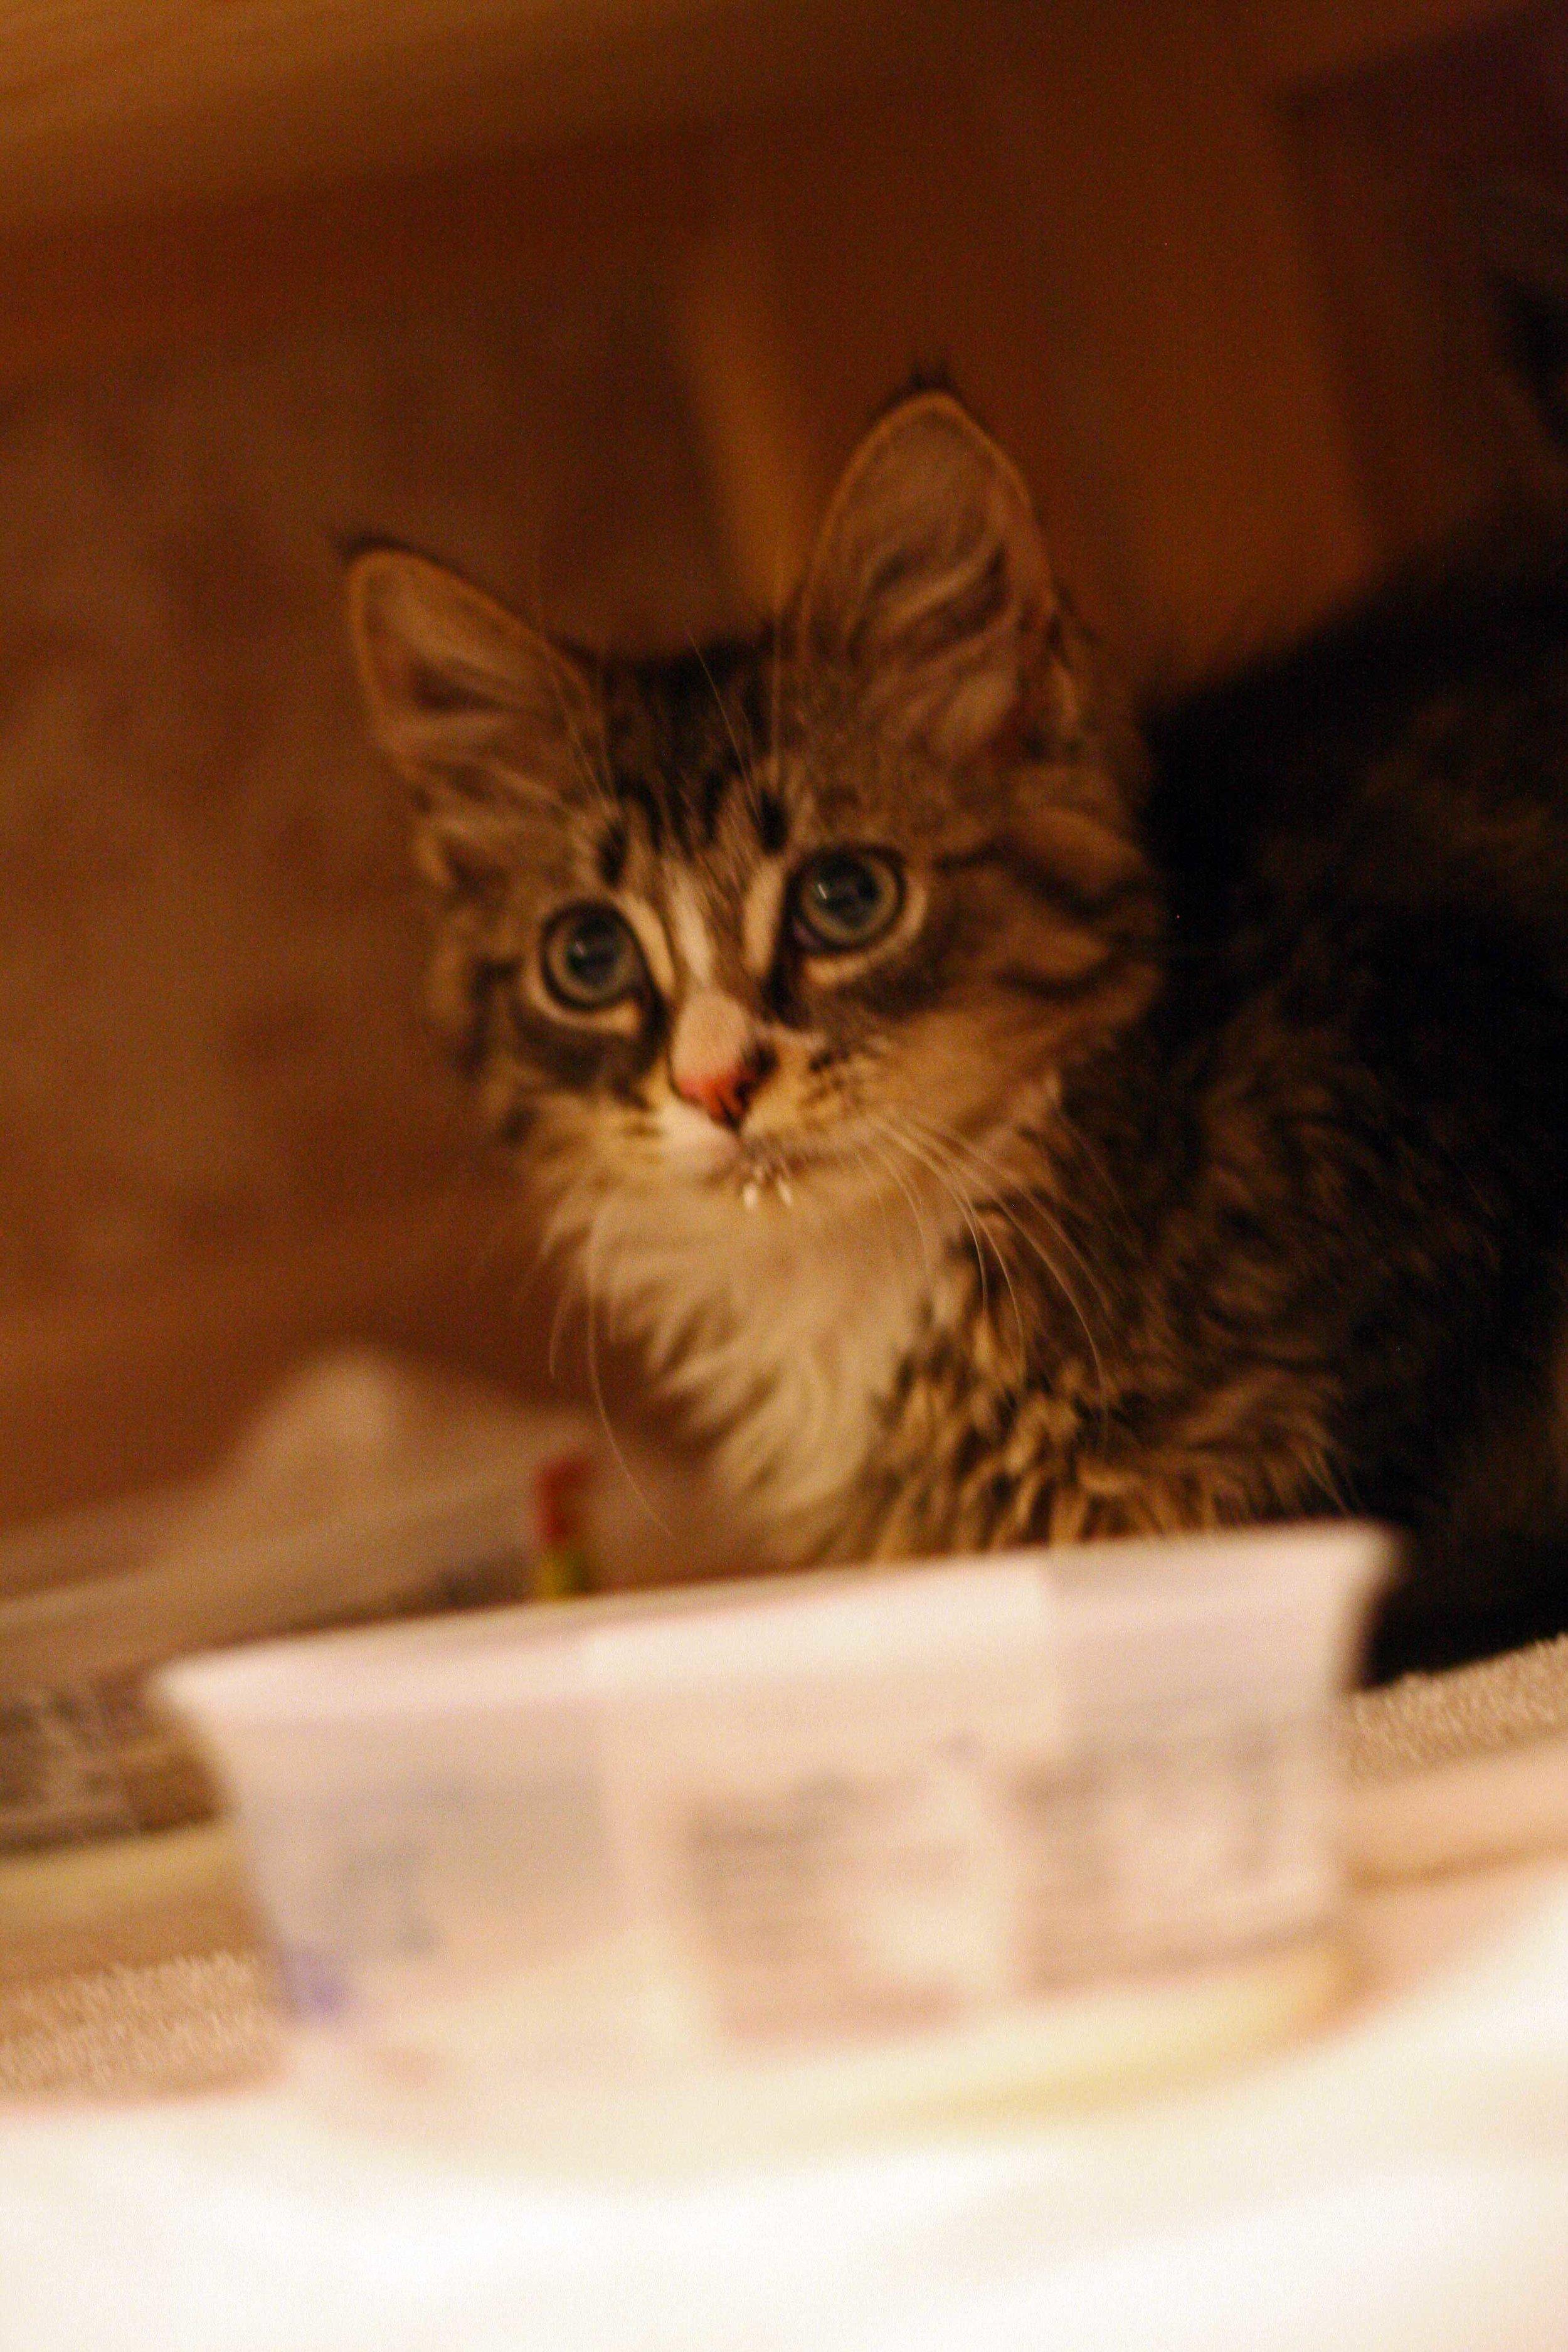 Cats-02-Web.jpg